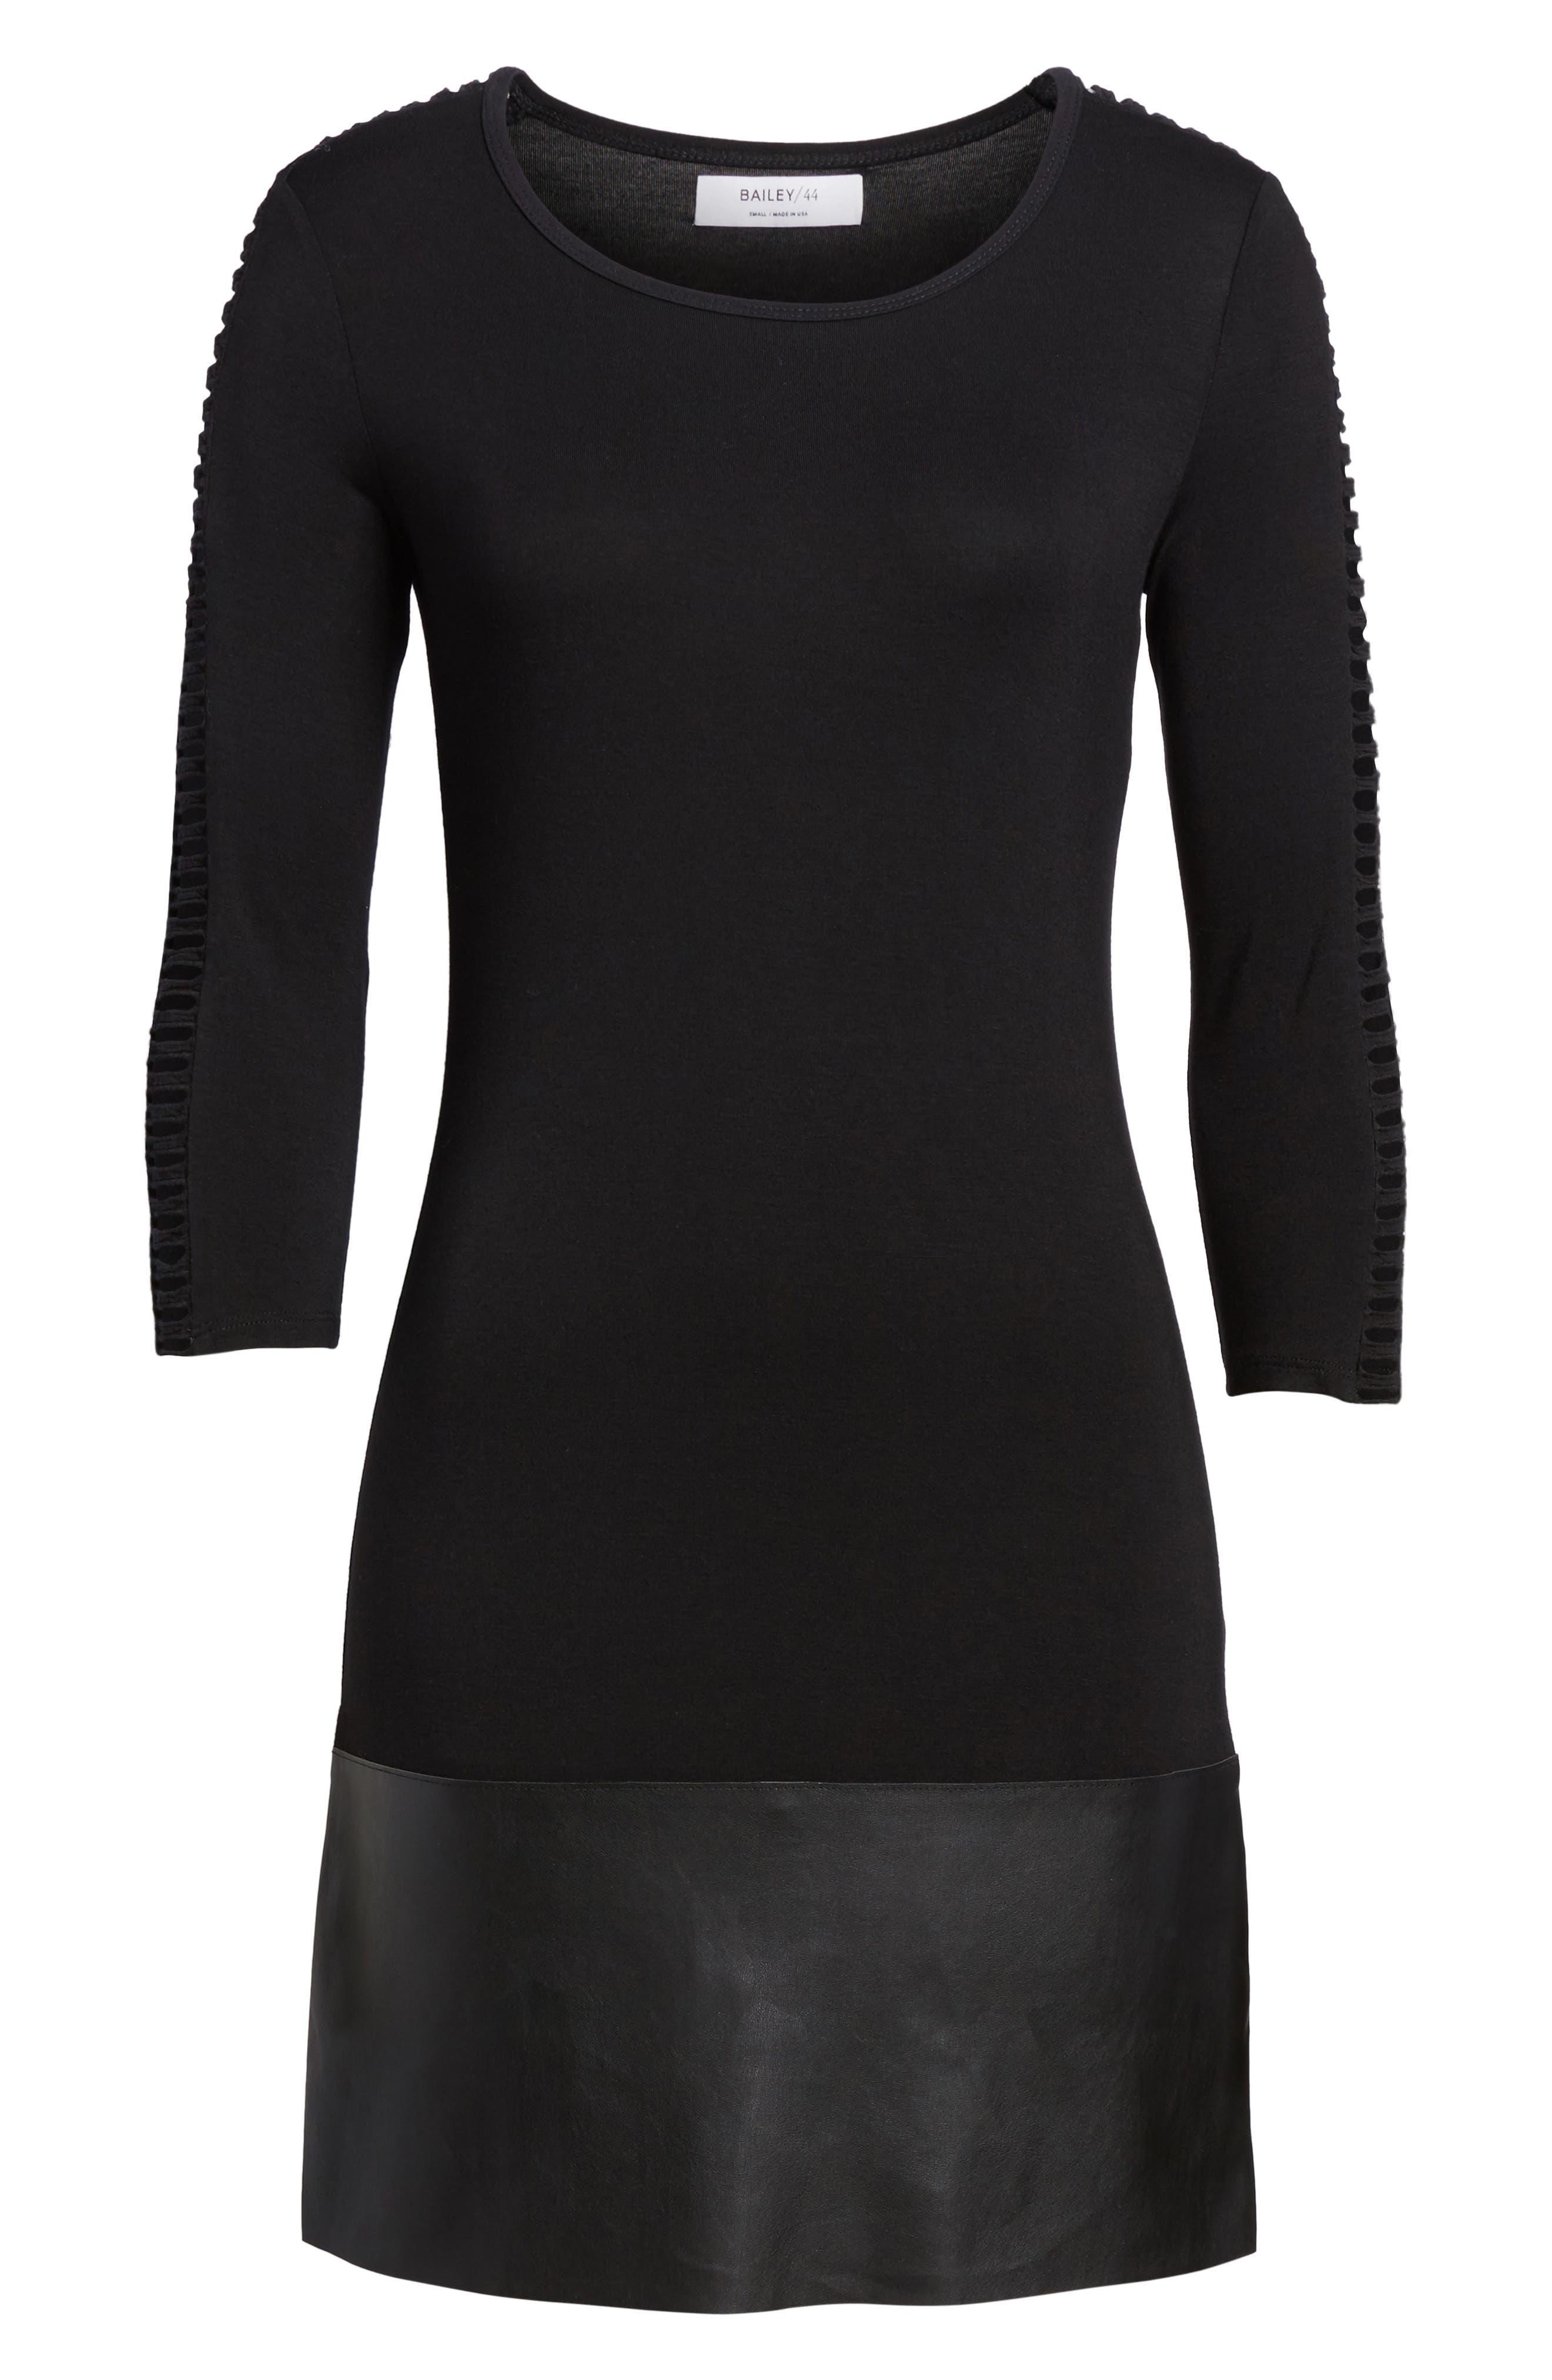 Kendo Dress,                             Alternate thumbnail 6, color,                             Black